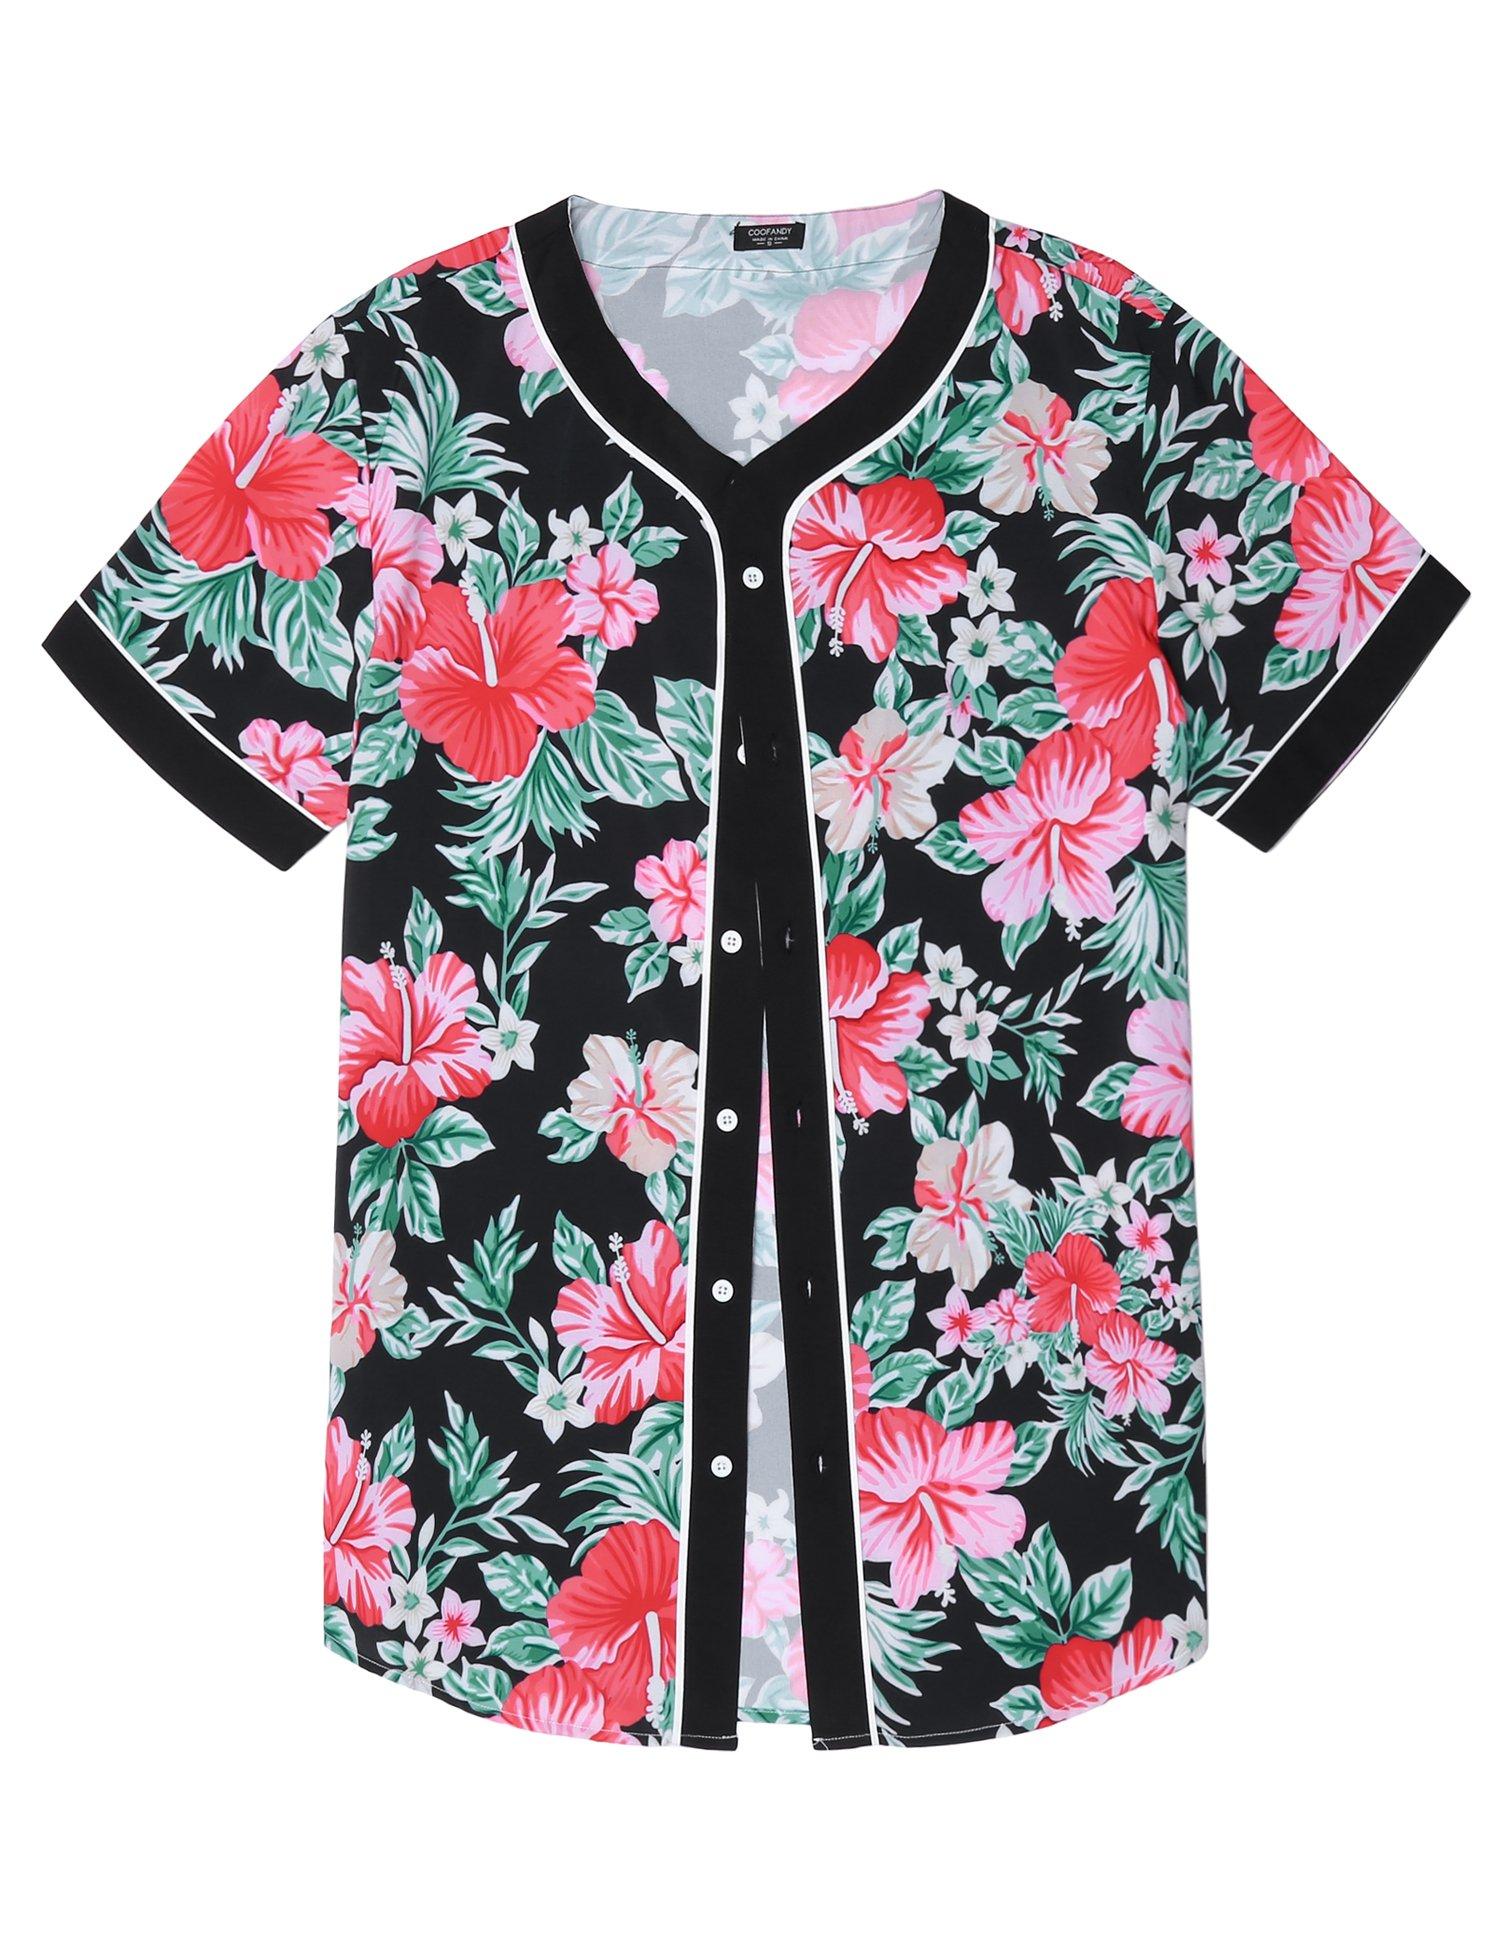 COOFANDY Mens Casual Floral Print Hip Hop Button Down Baseball Jersey Shirts, Pat, Large